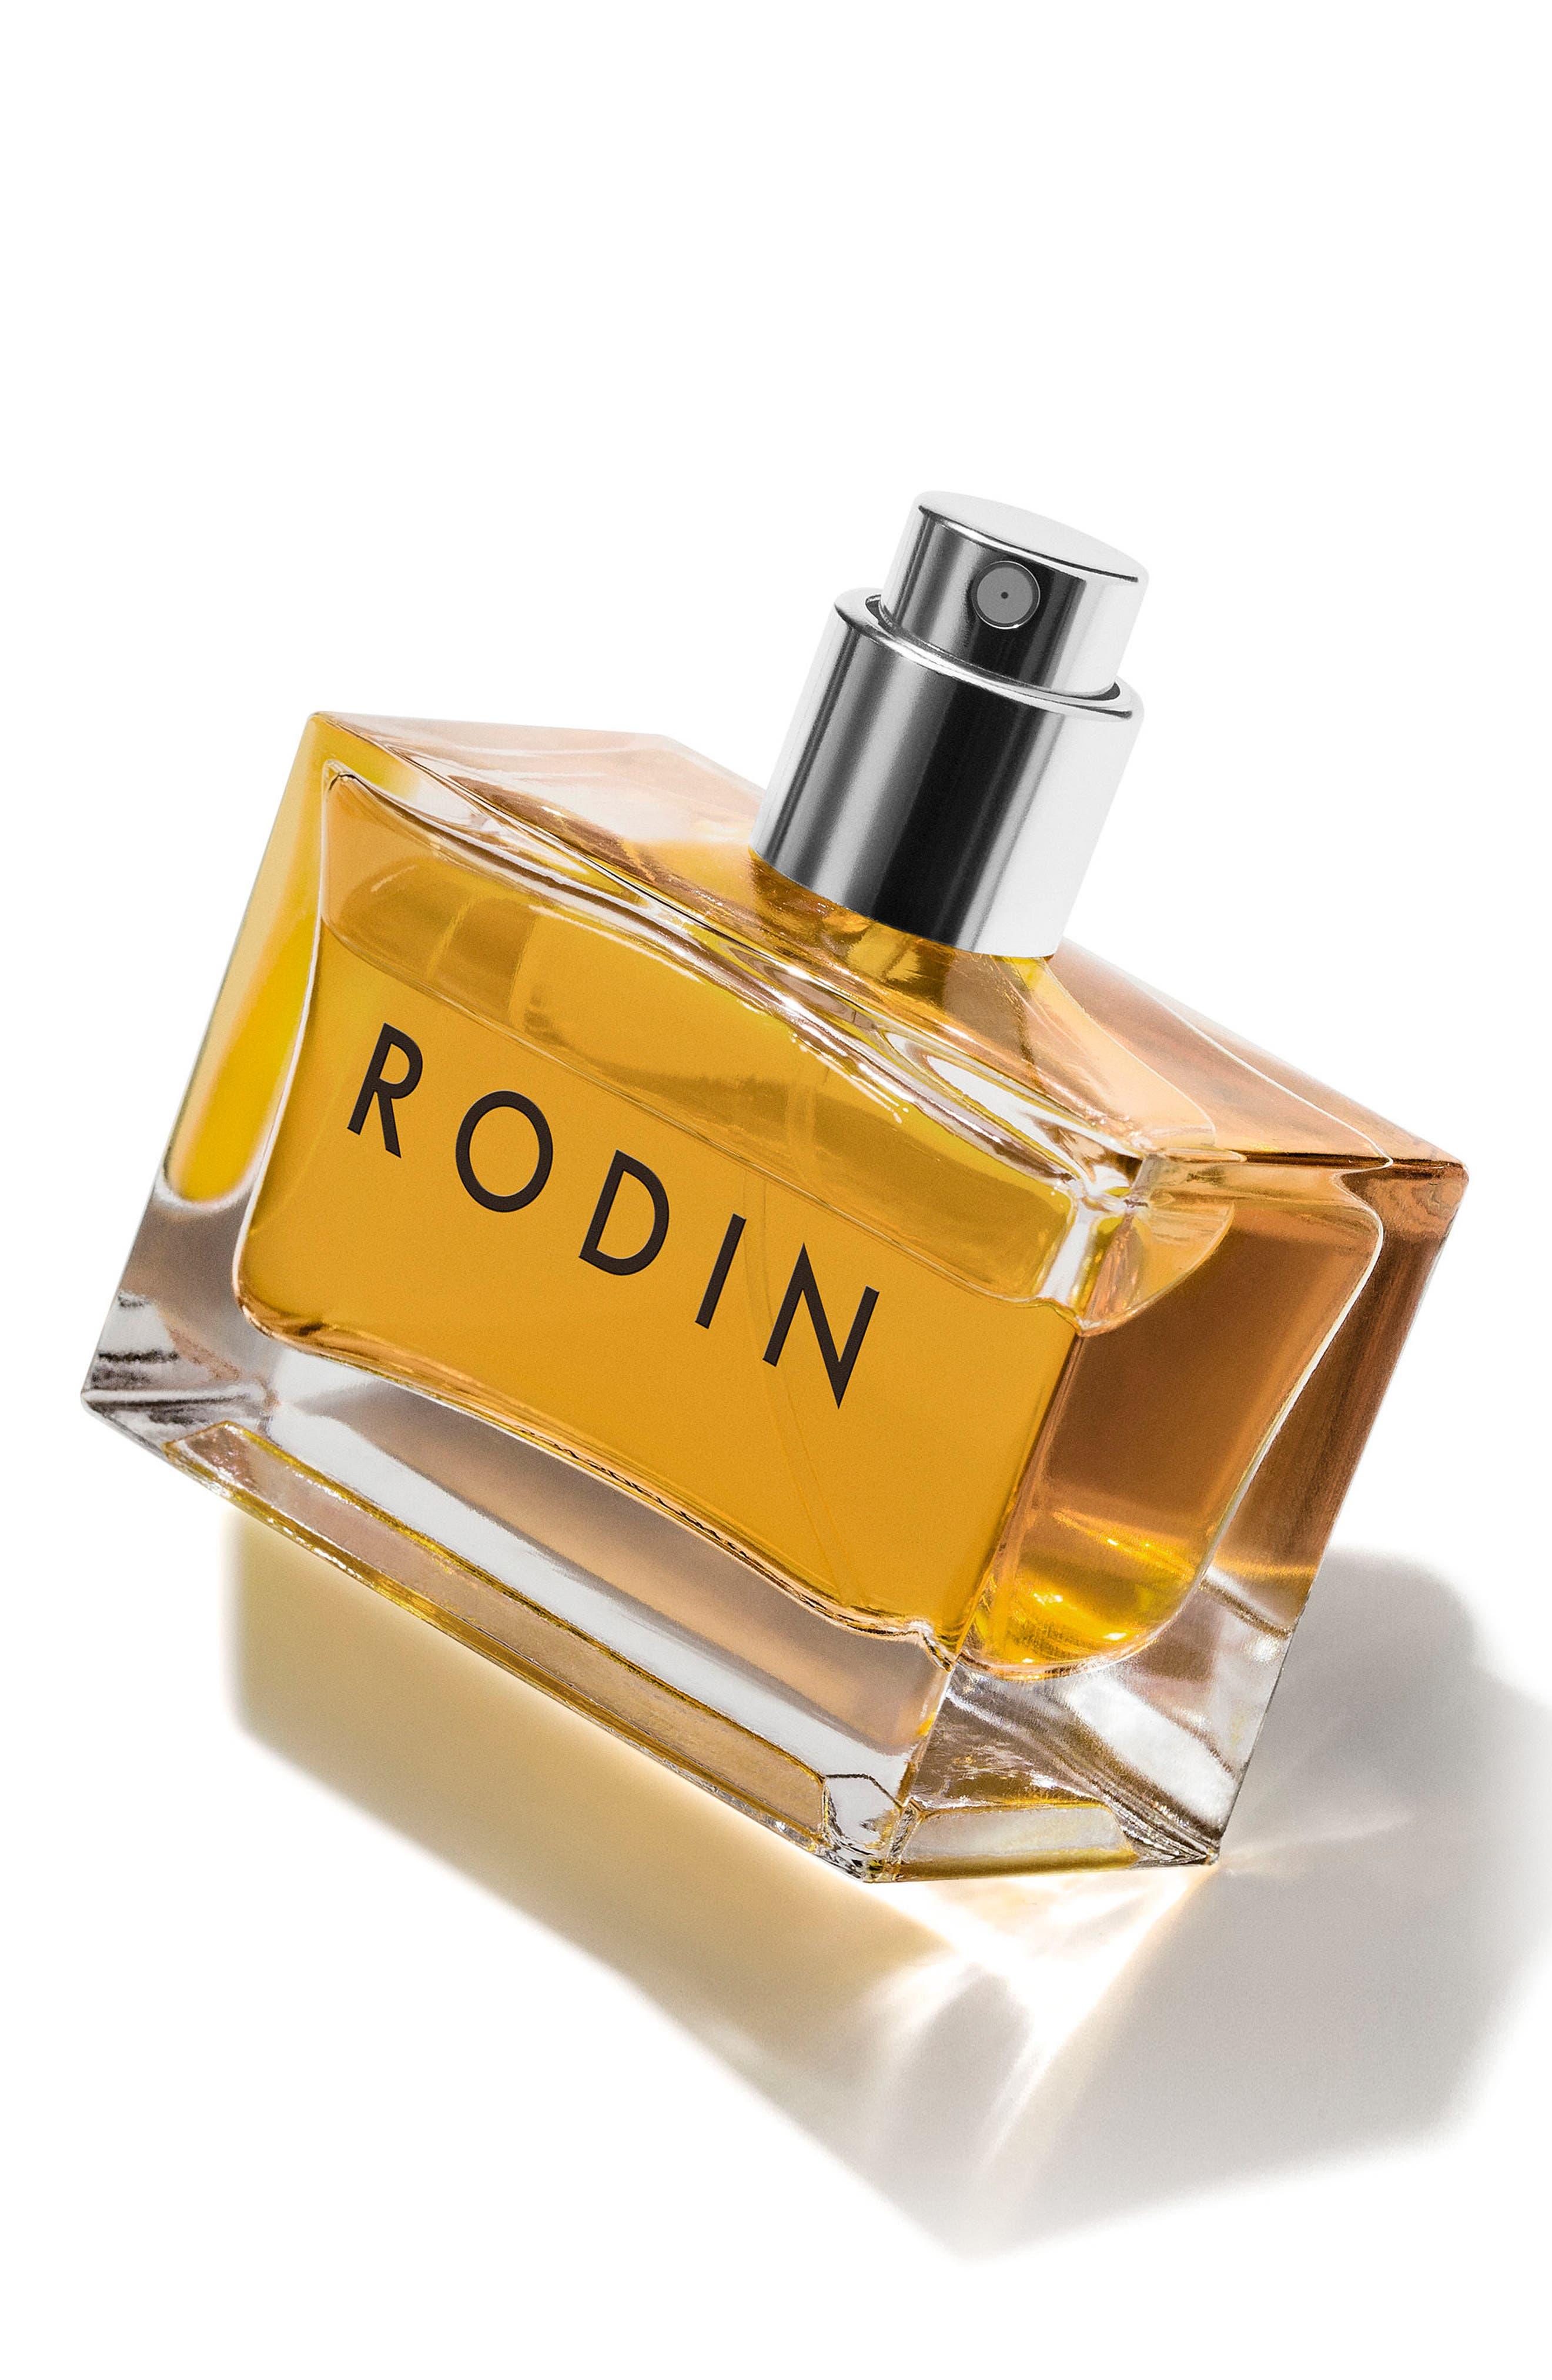 Alternate Image 3  - RODIN olio lusso Perfume